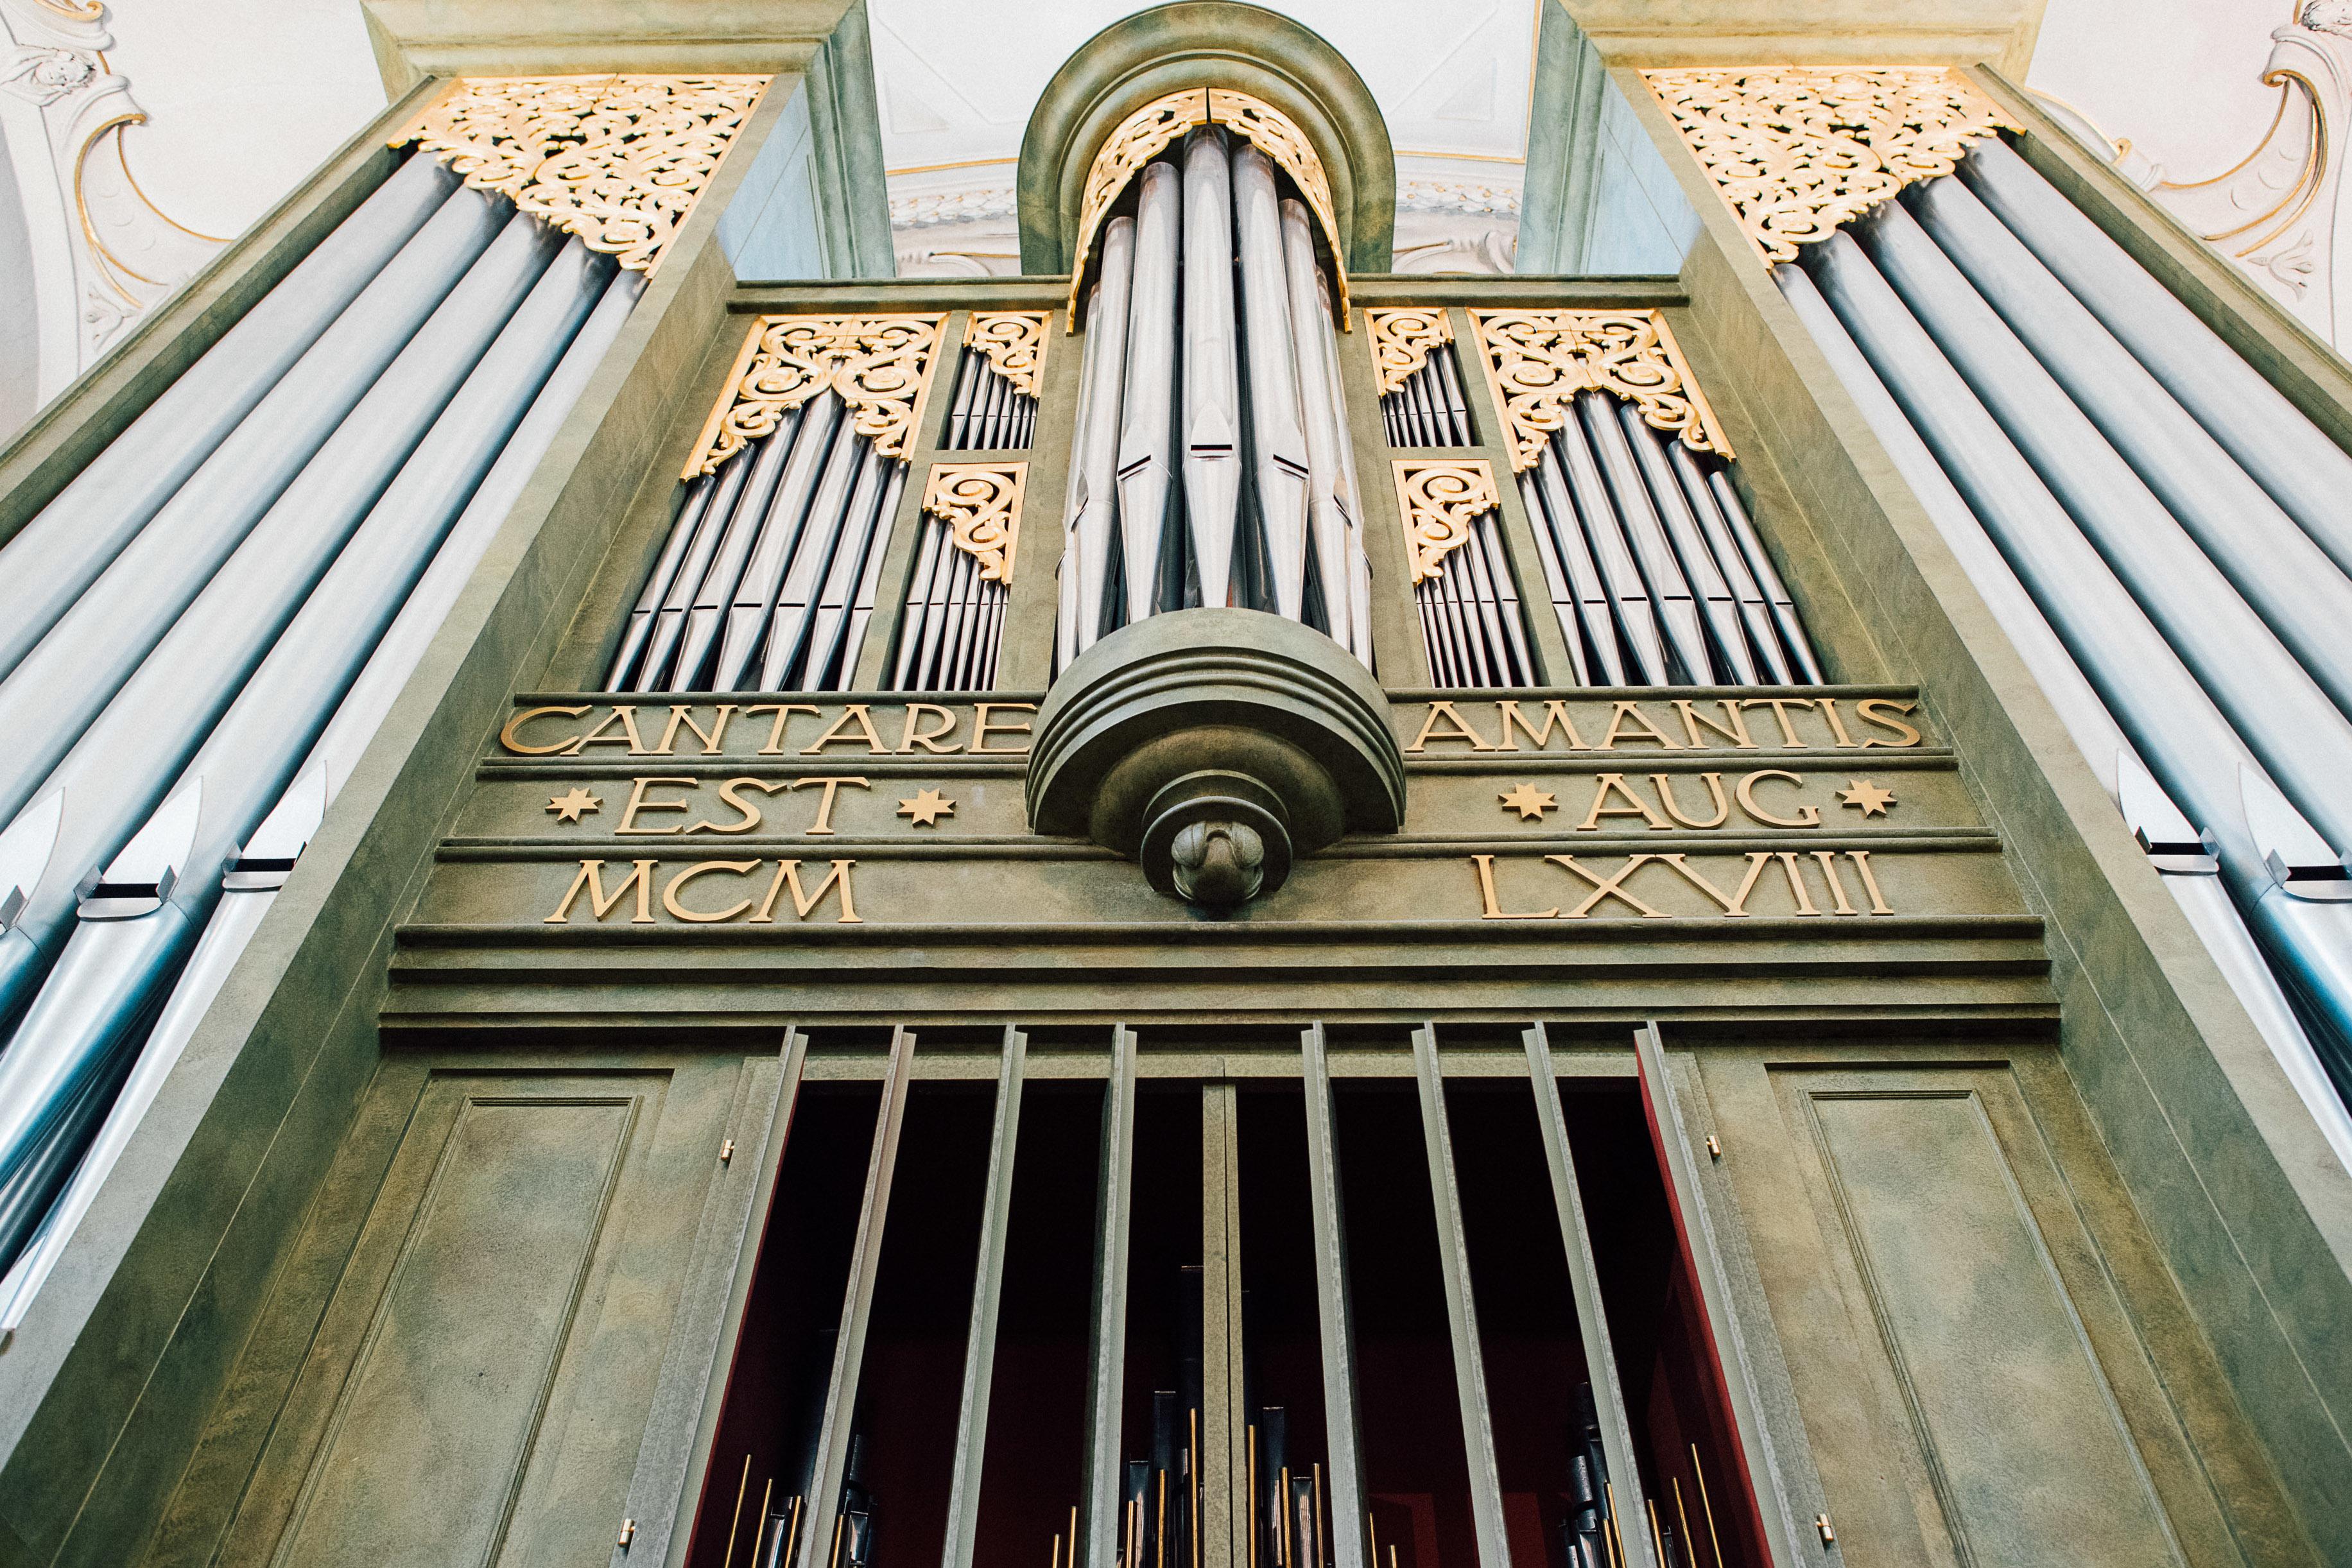 Orgel St. Ursula